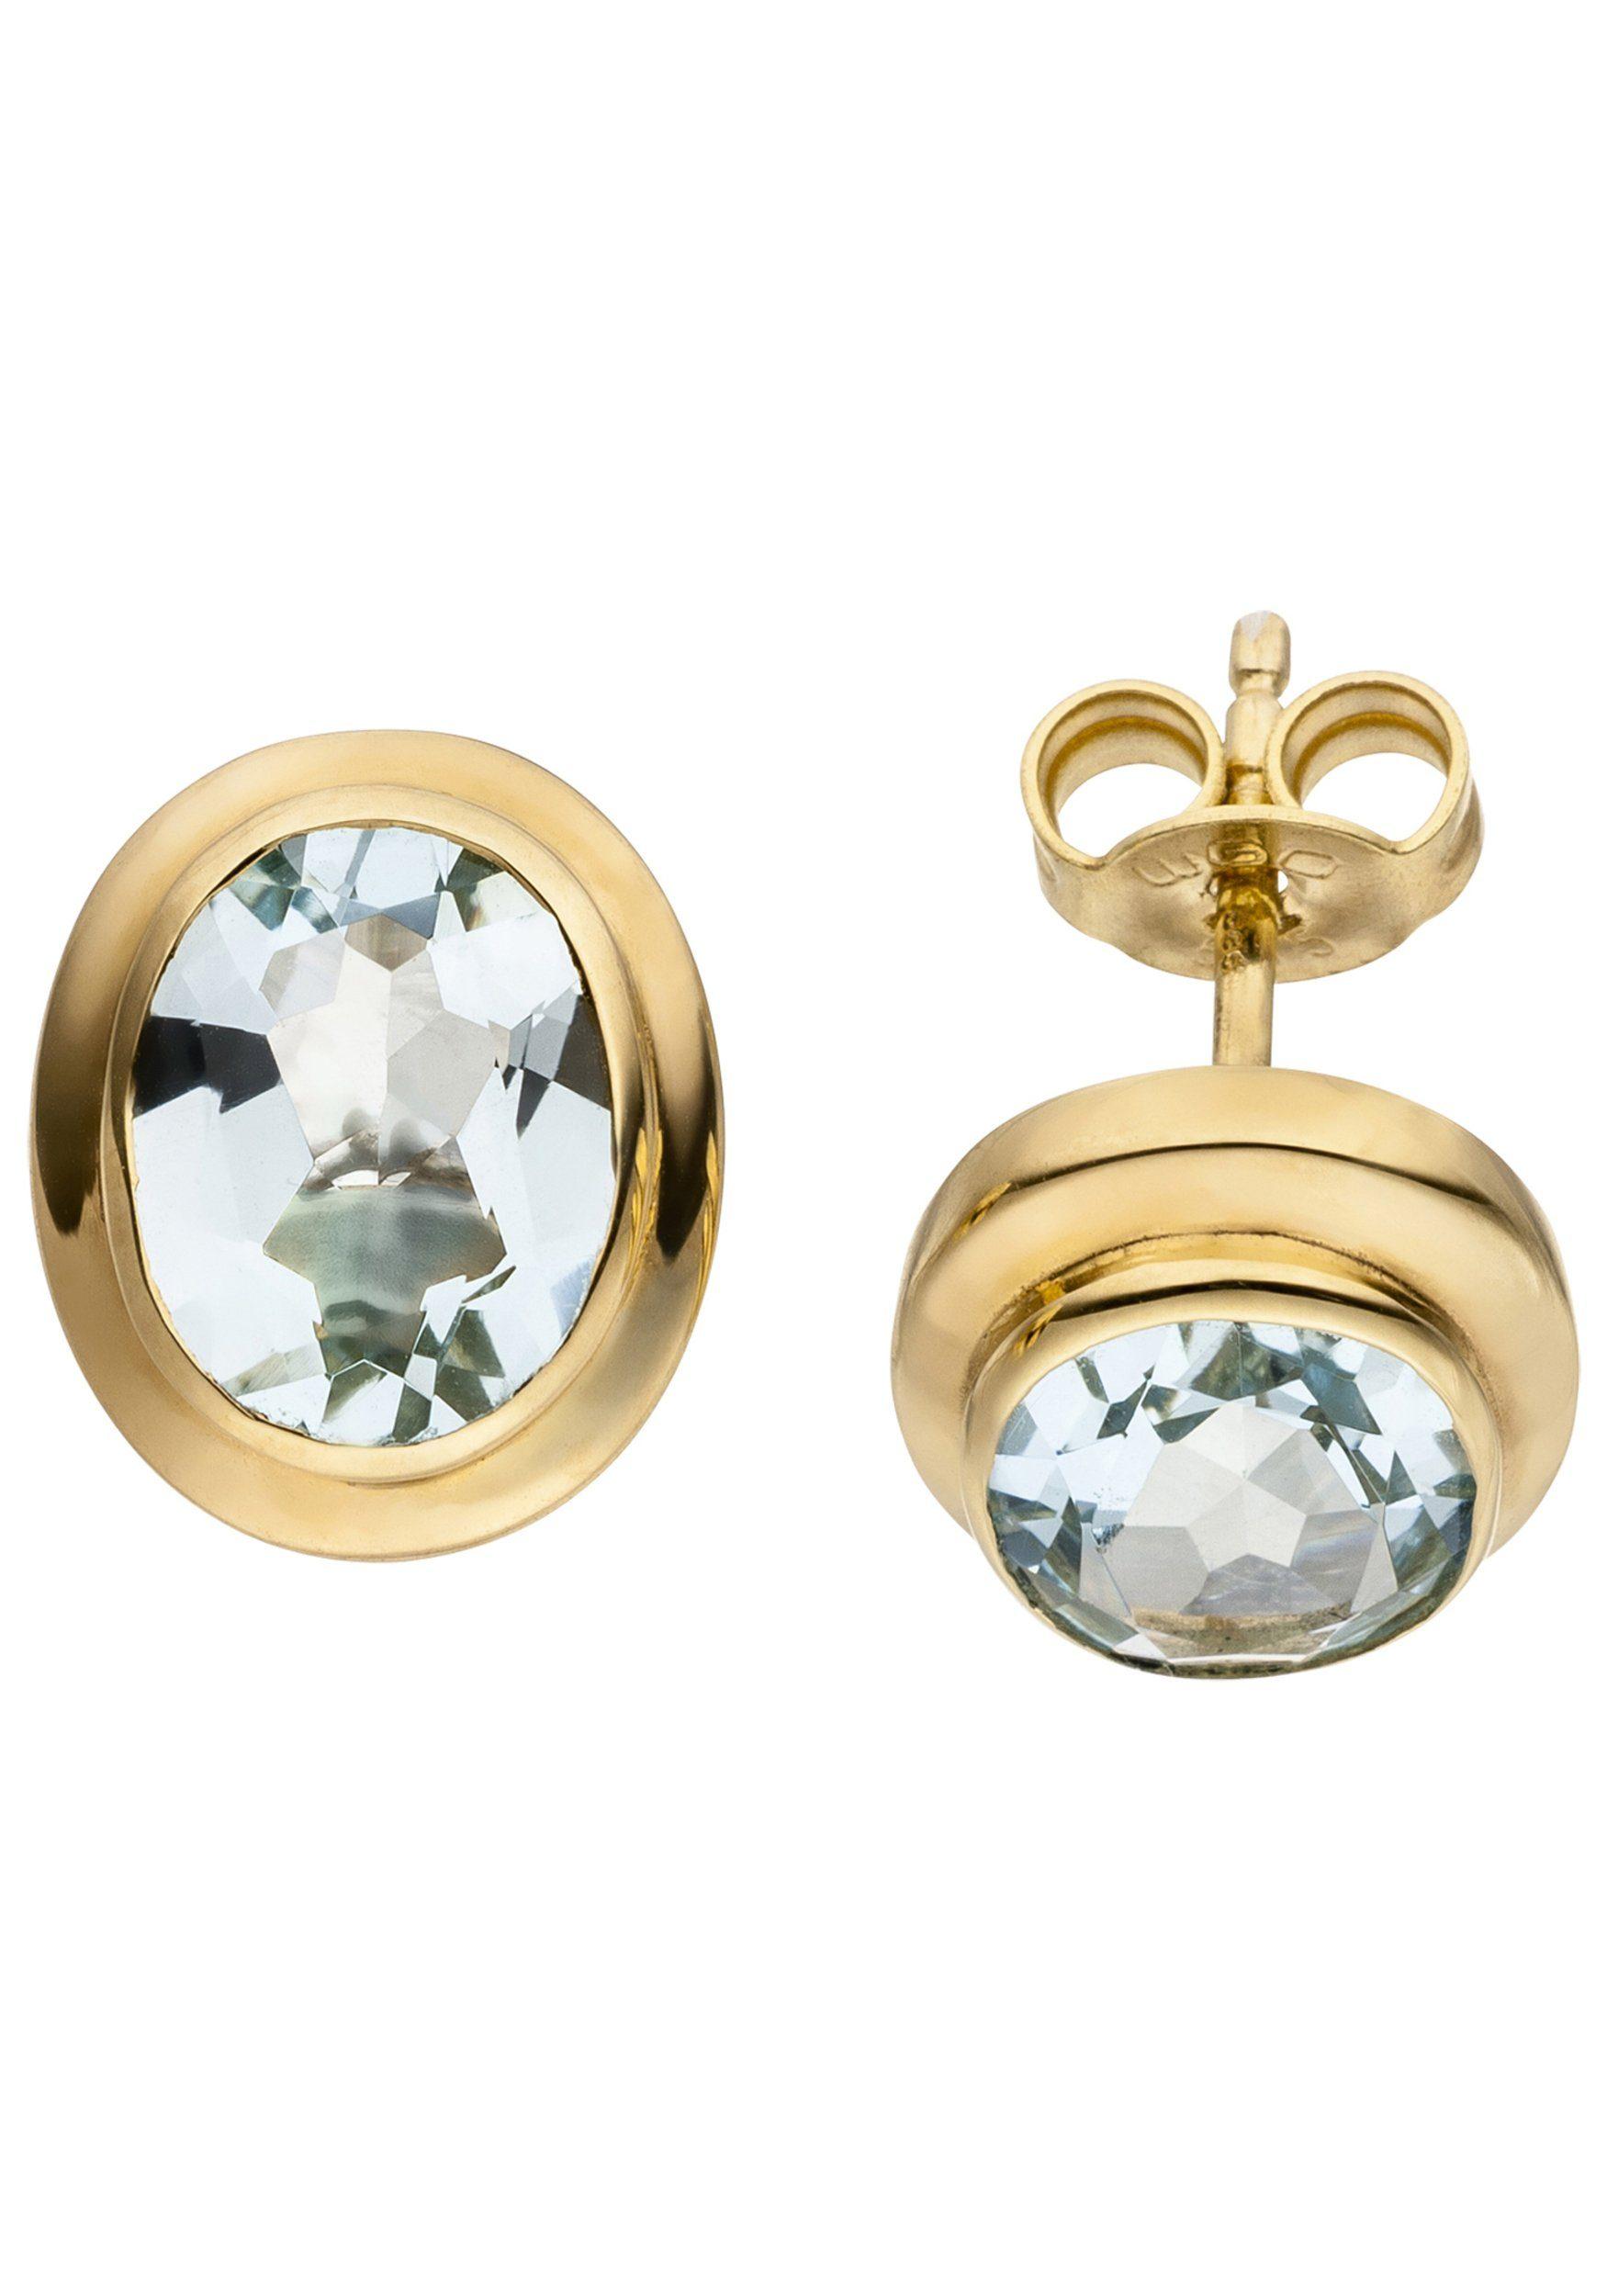 JOBO Paar Ohrstecker oval 585 Gold mit Aquamarin